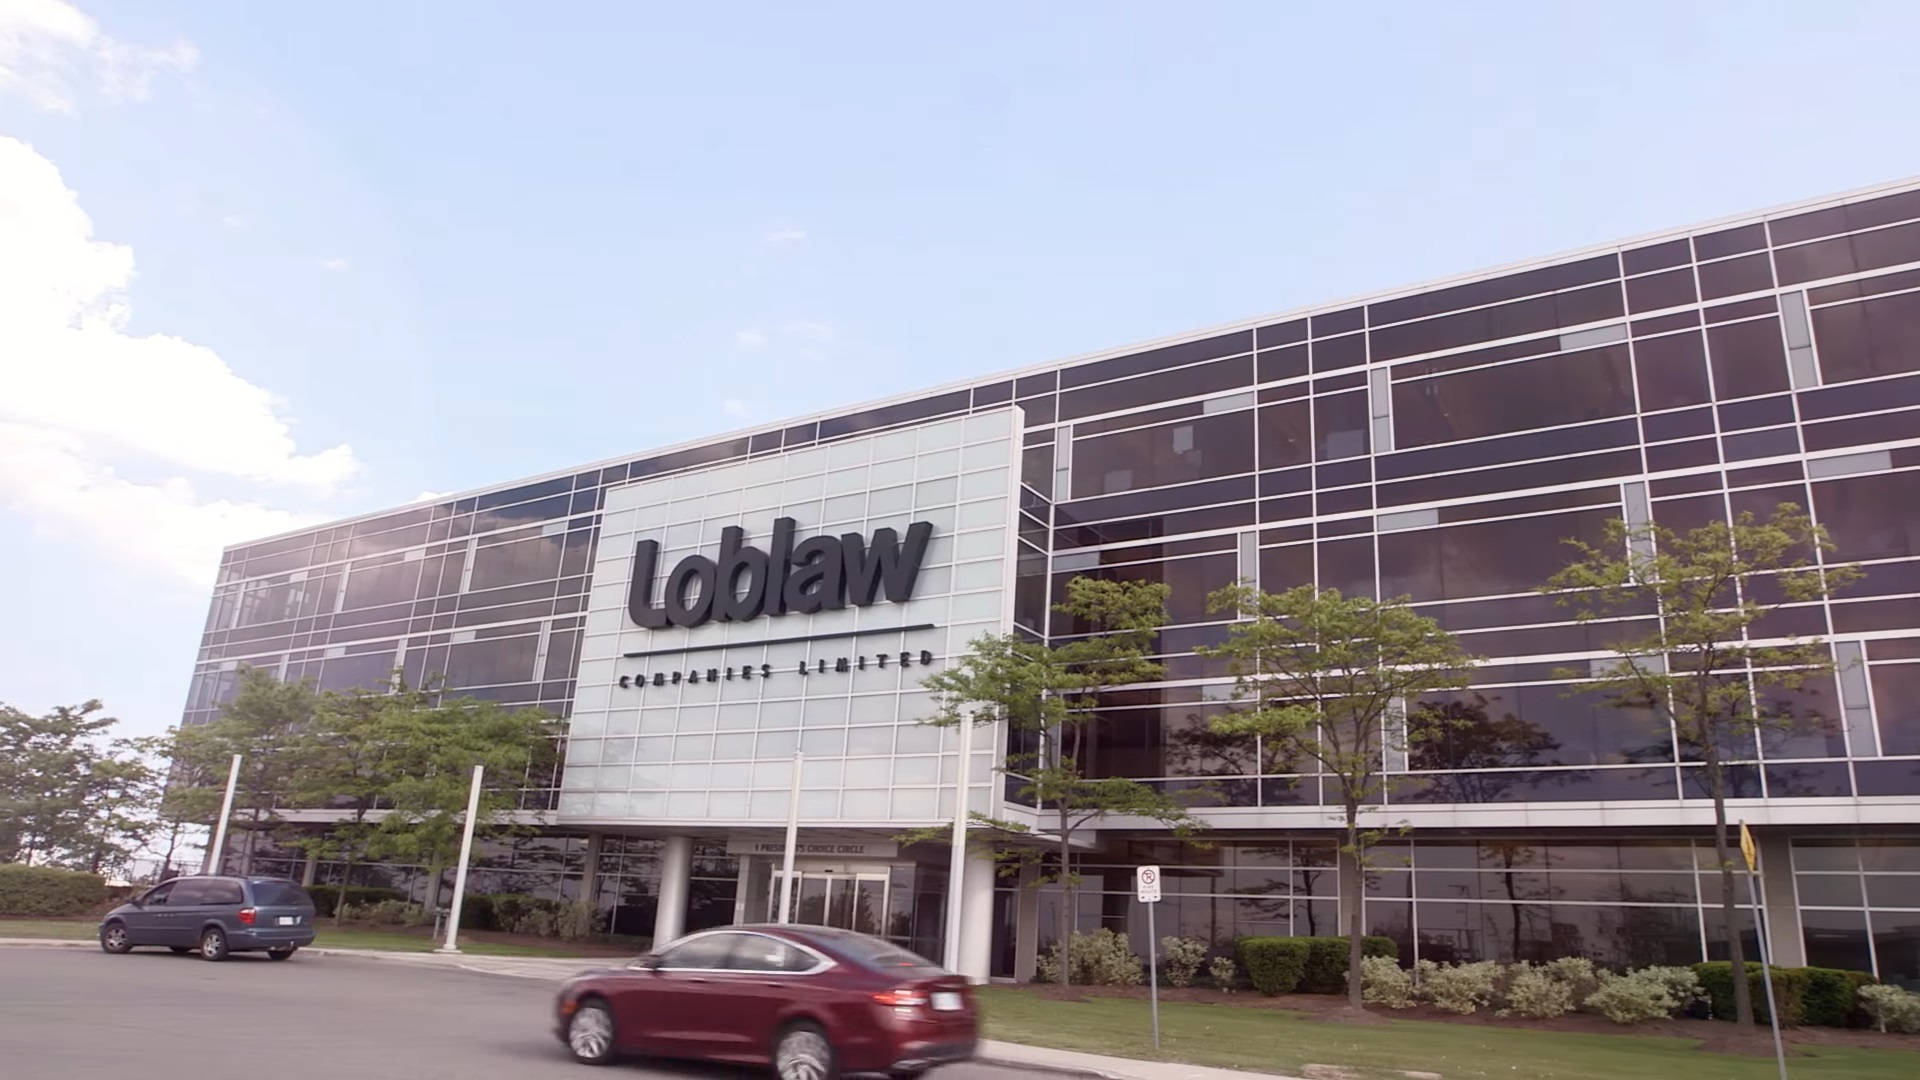 How To Take Loblaws Store Survey